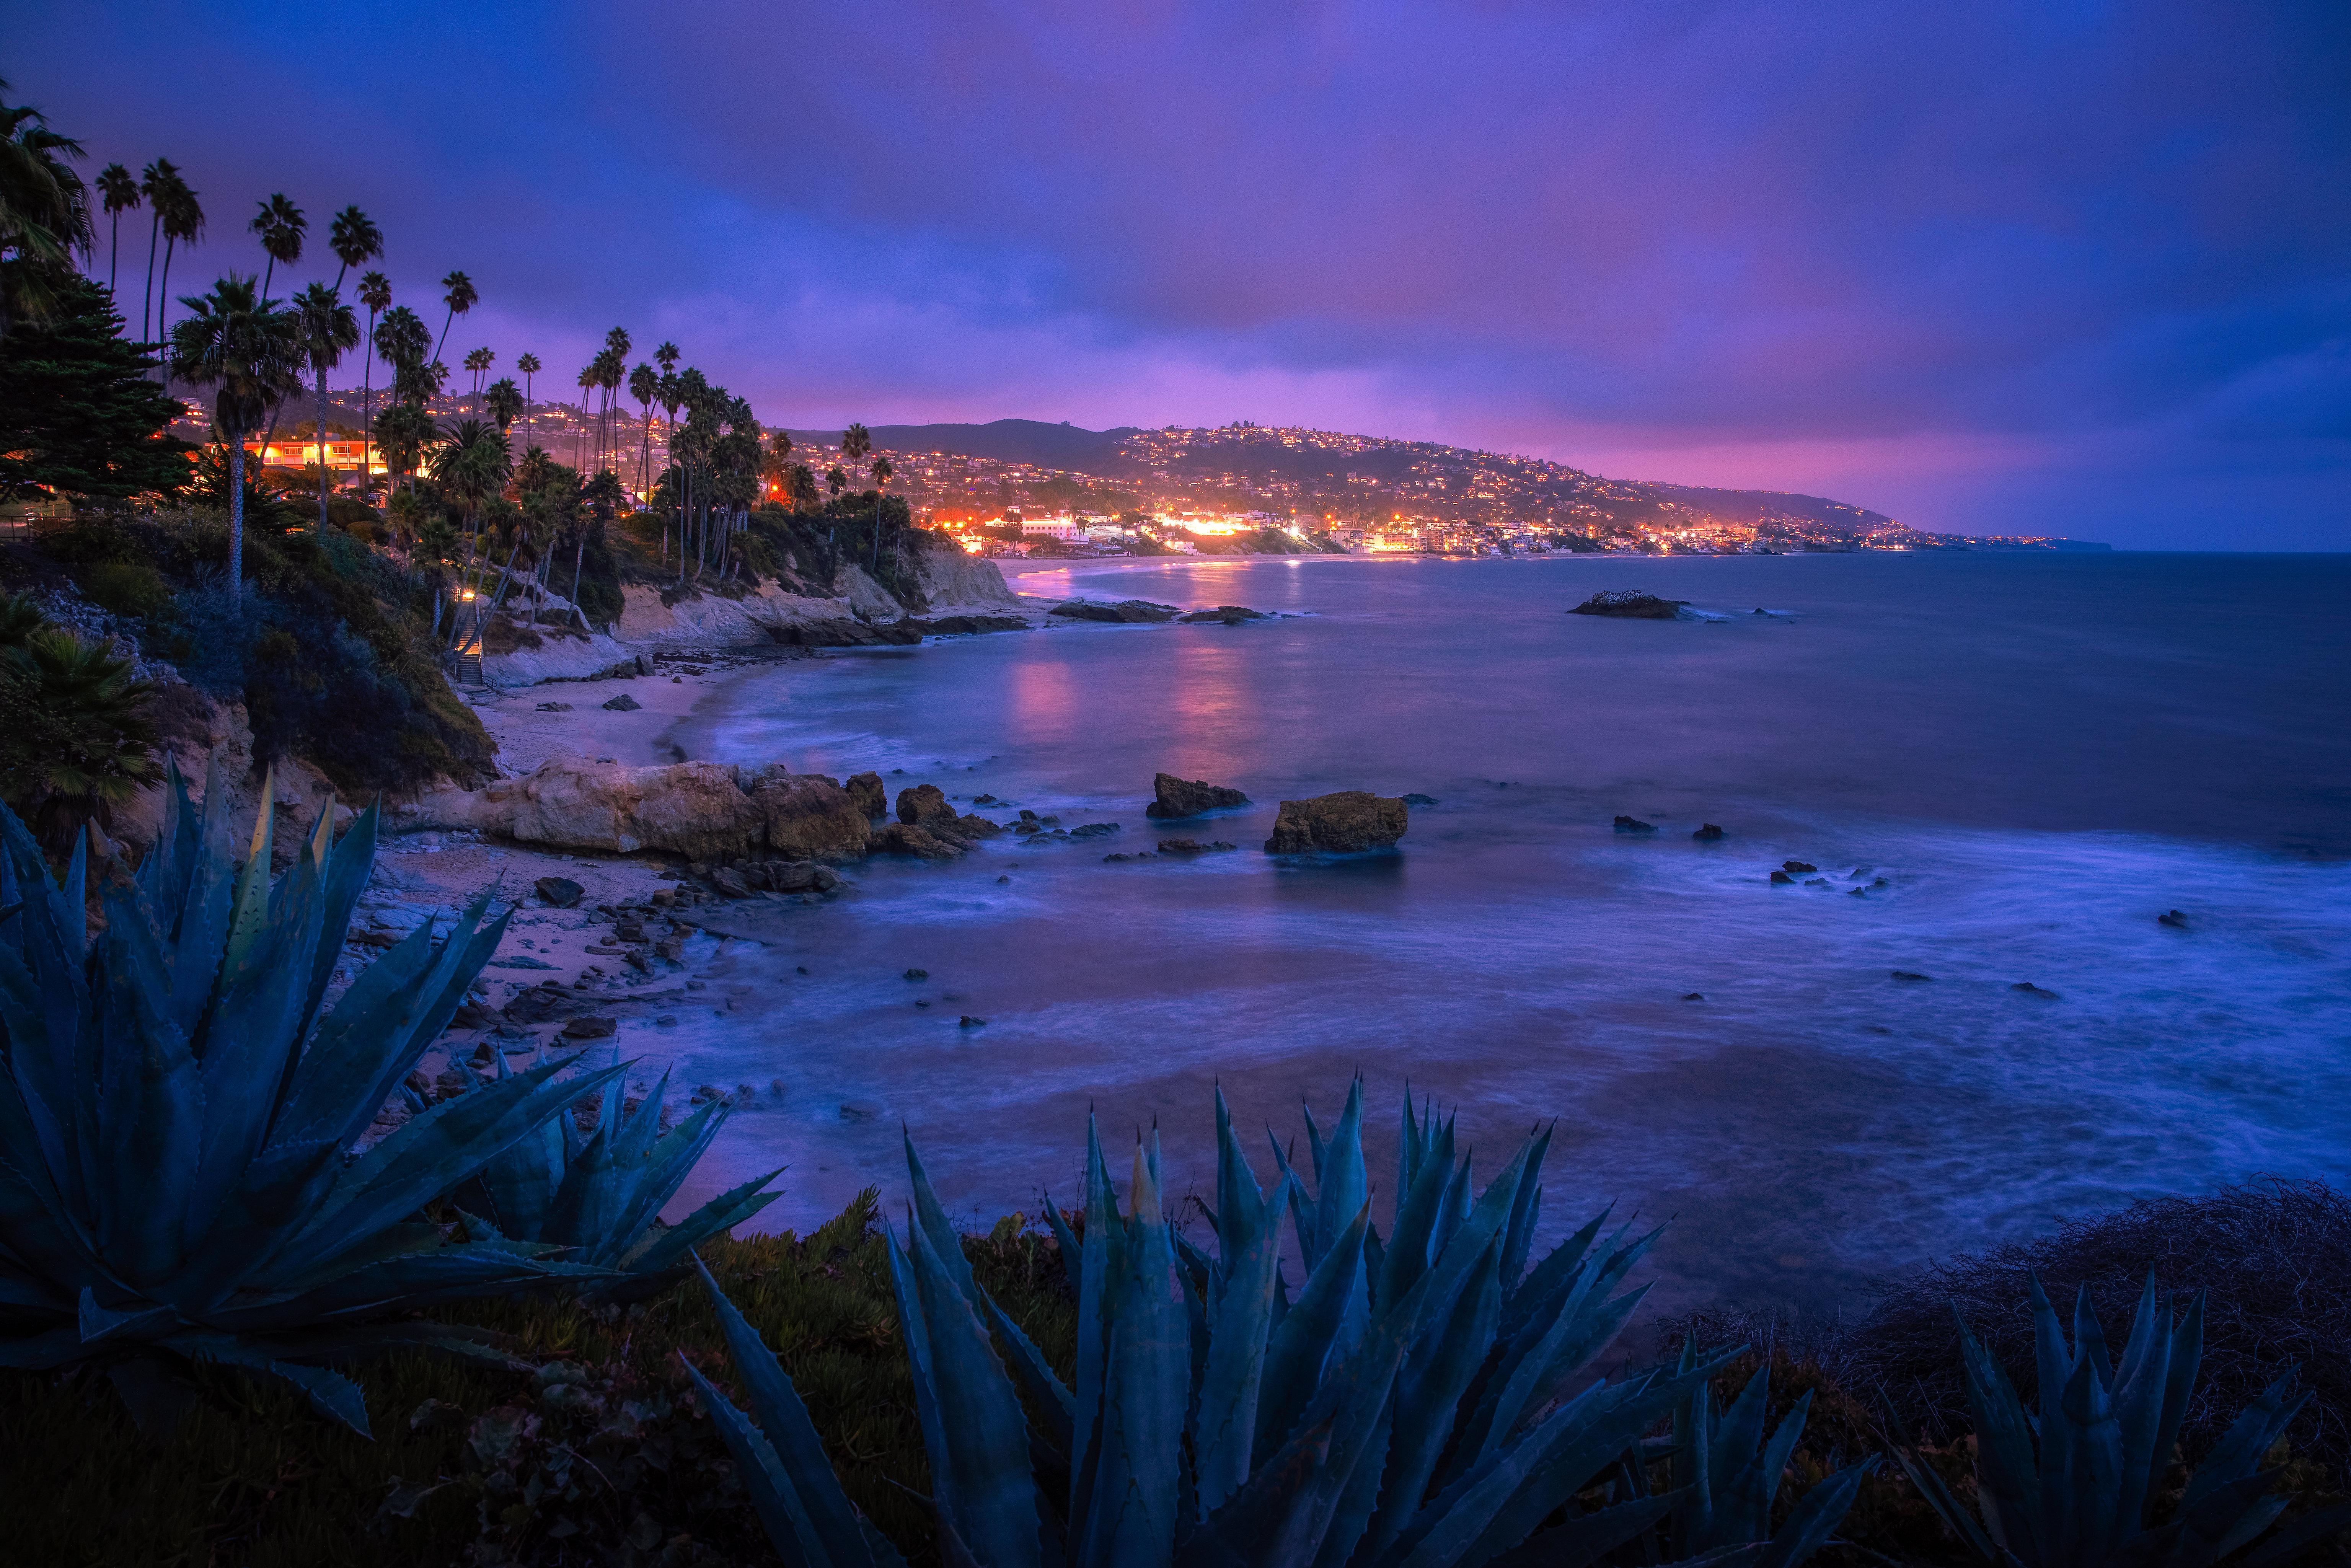 Fondos de pantalla Playa Laguna en Orange County